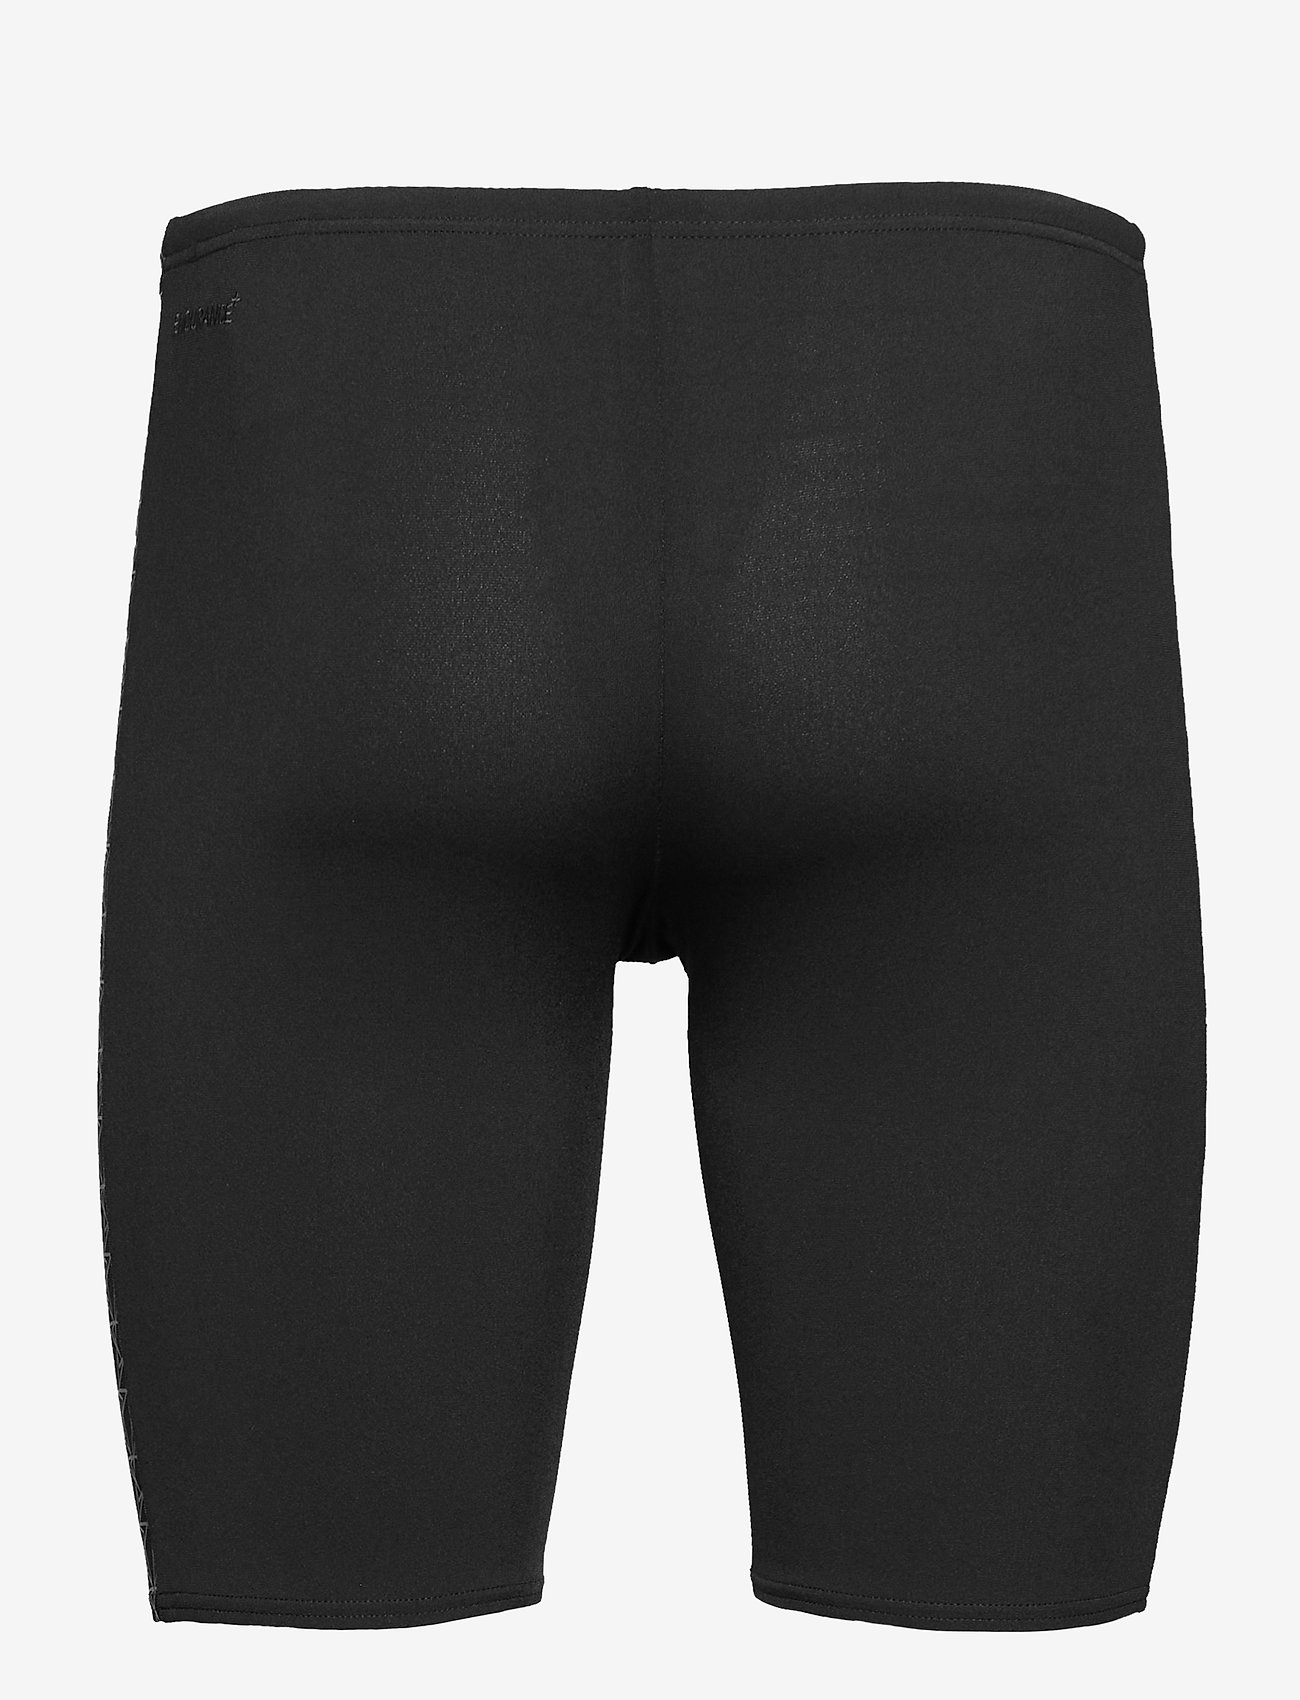 Speedo - Boomstar Splice Jammer - briefs - black/oxid grey - 1